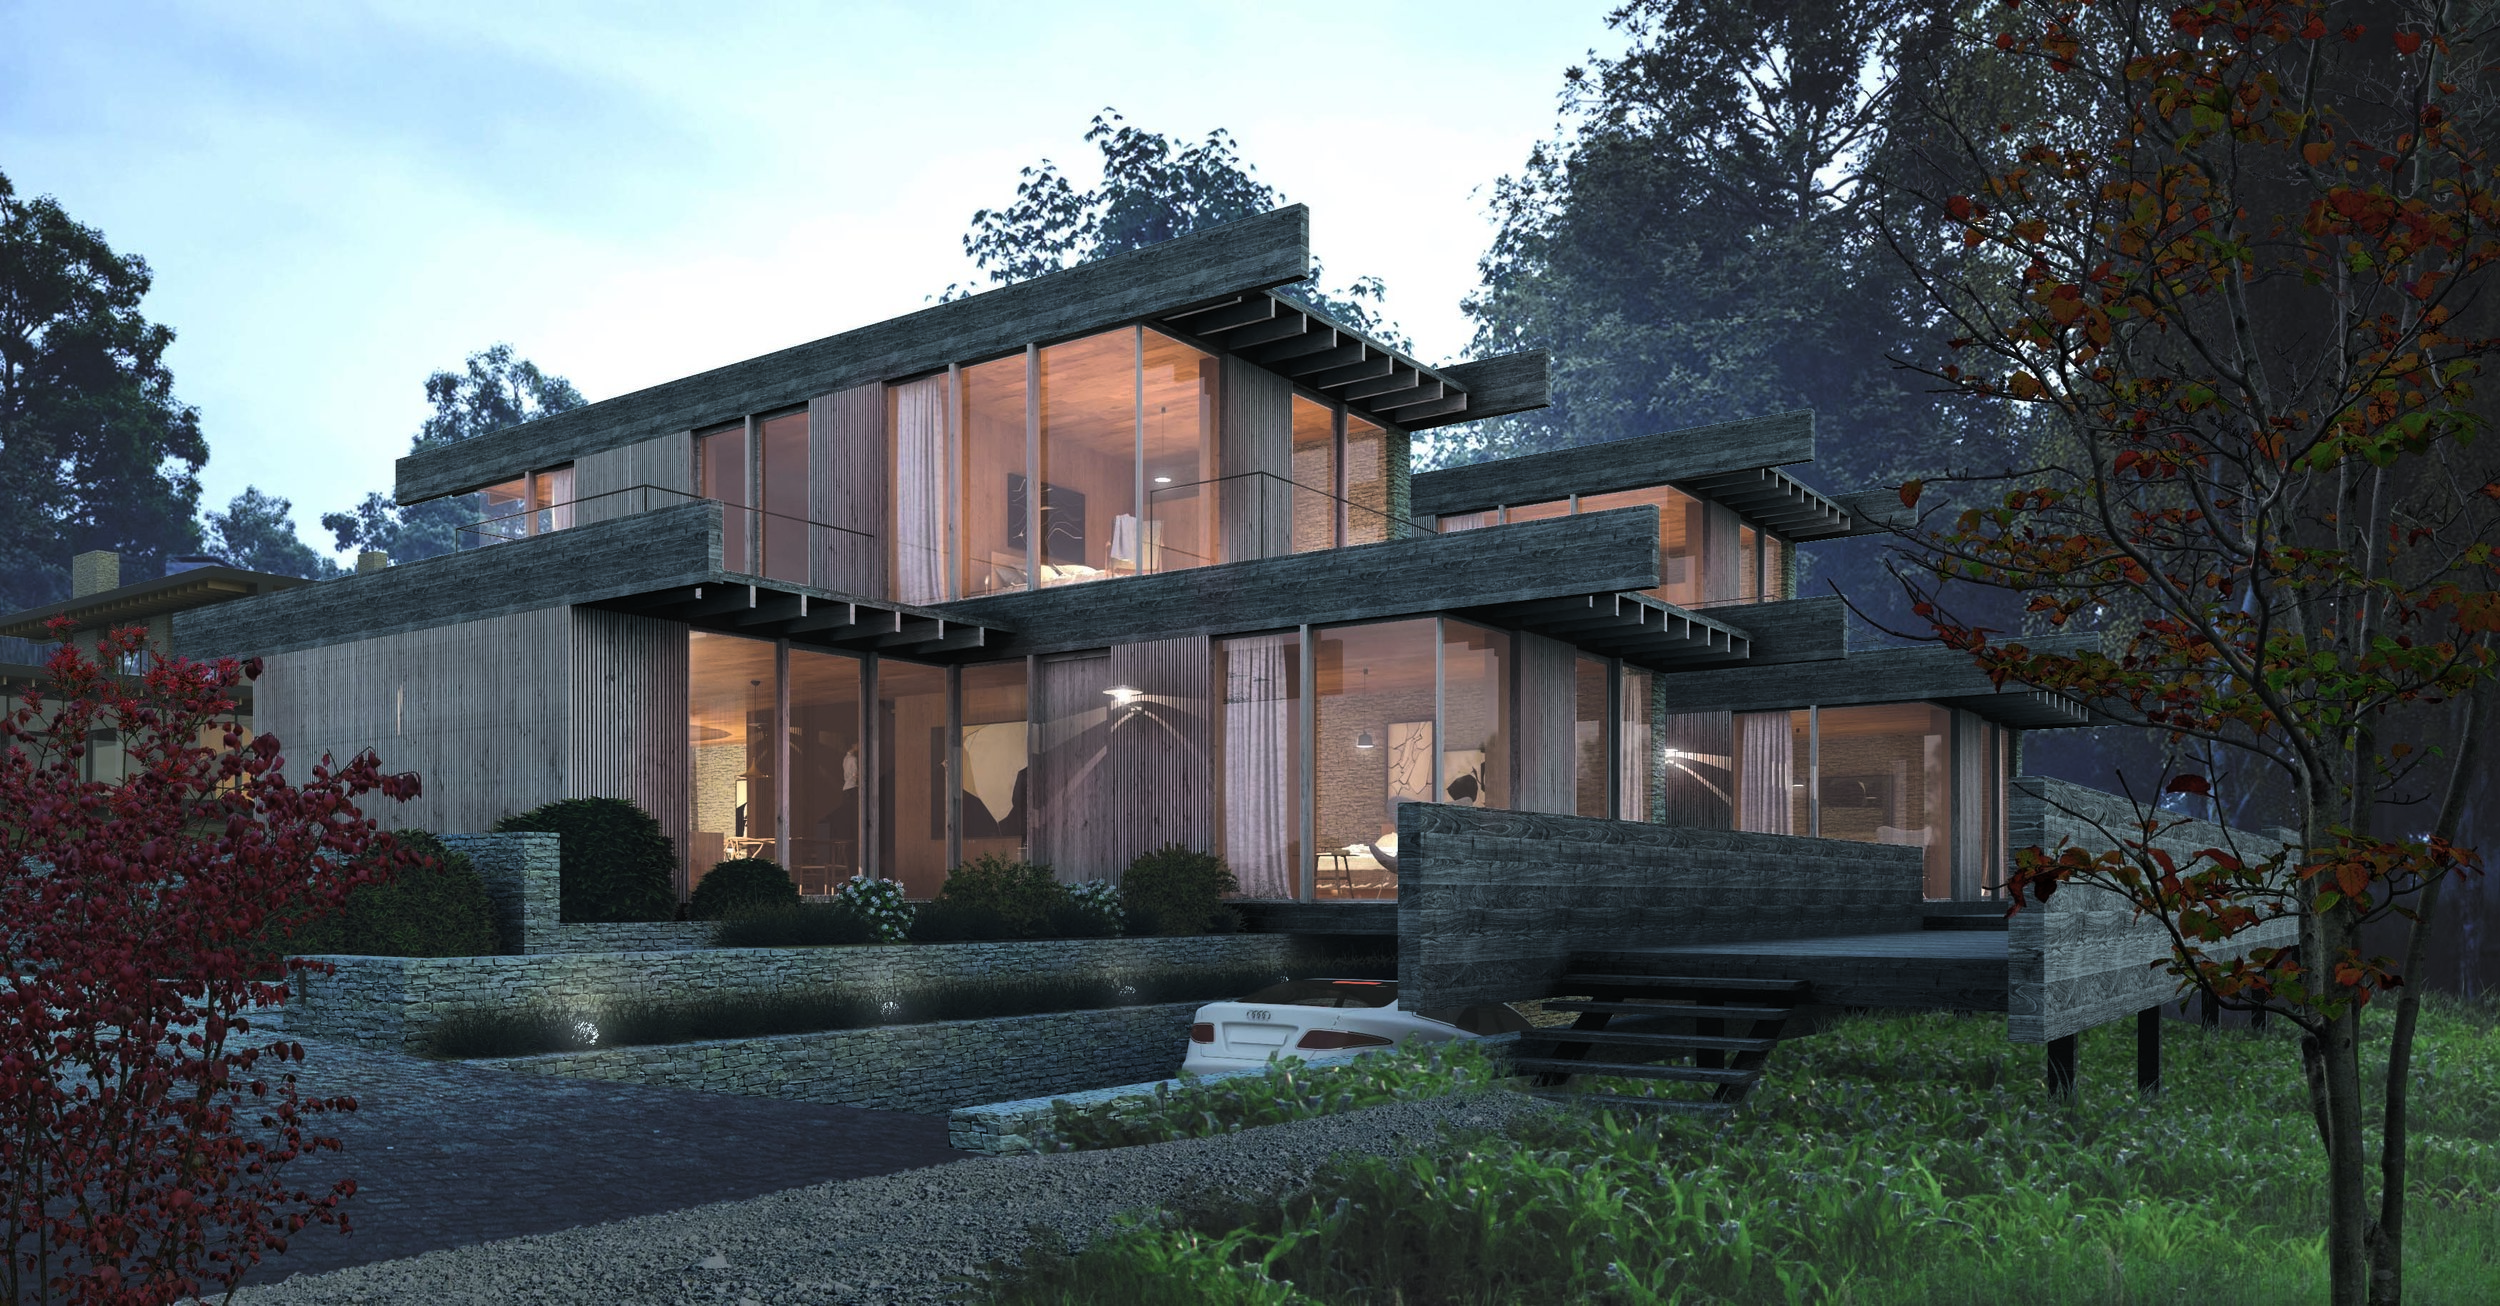 doublehouse_front_mj.jpg